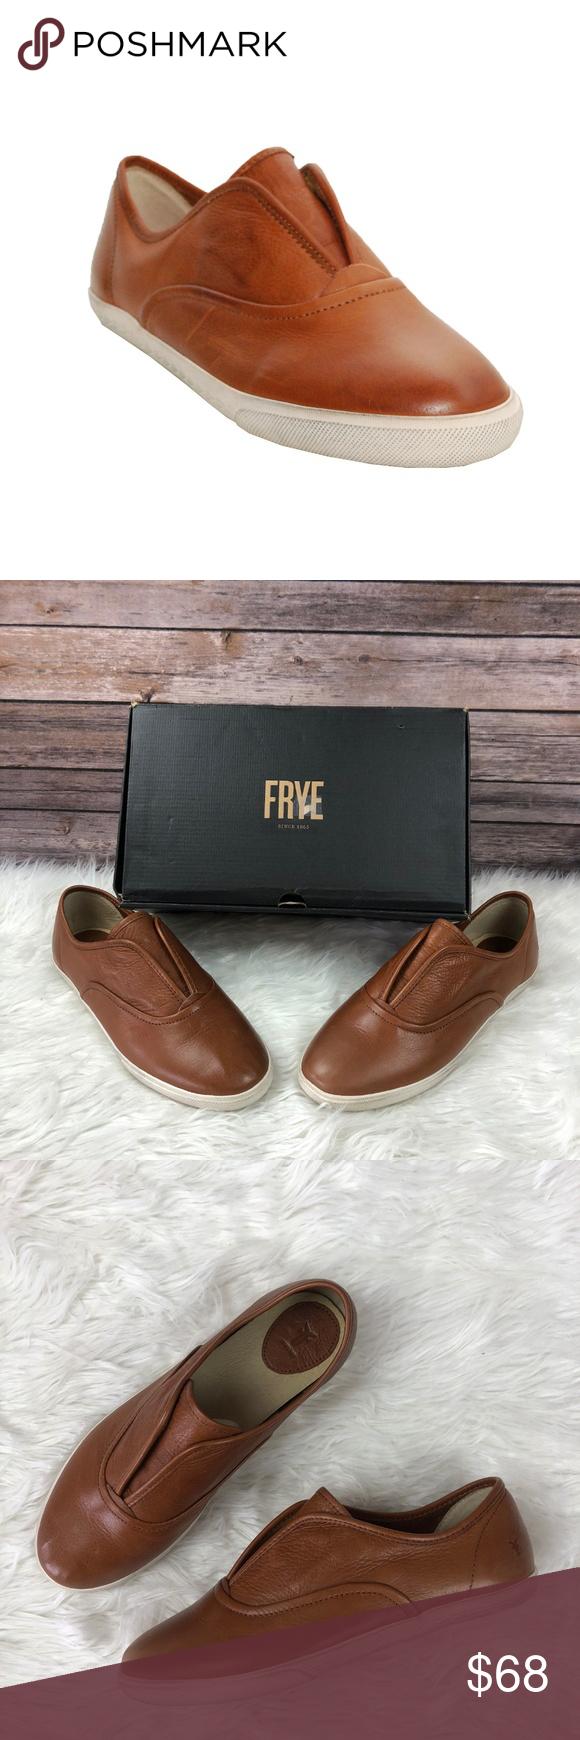 Frye Mindy Leather Slip On Sneaker Whiskey Brown Frye Slip On Sneaker Leather Slip Ons